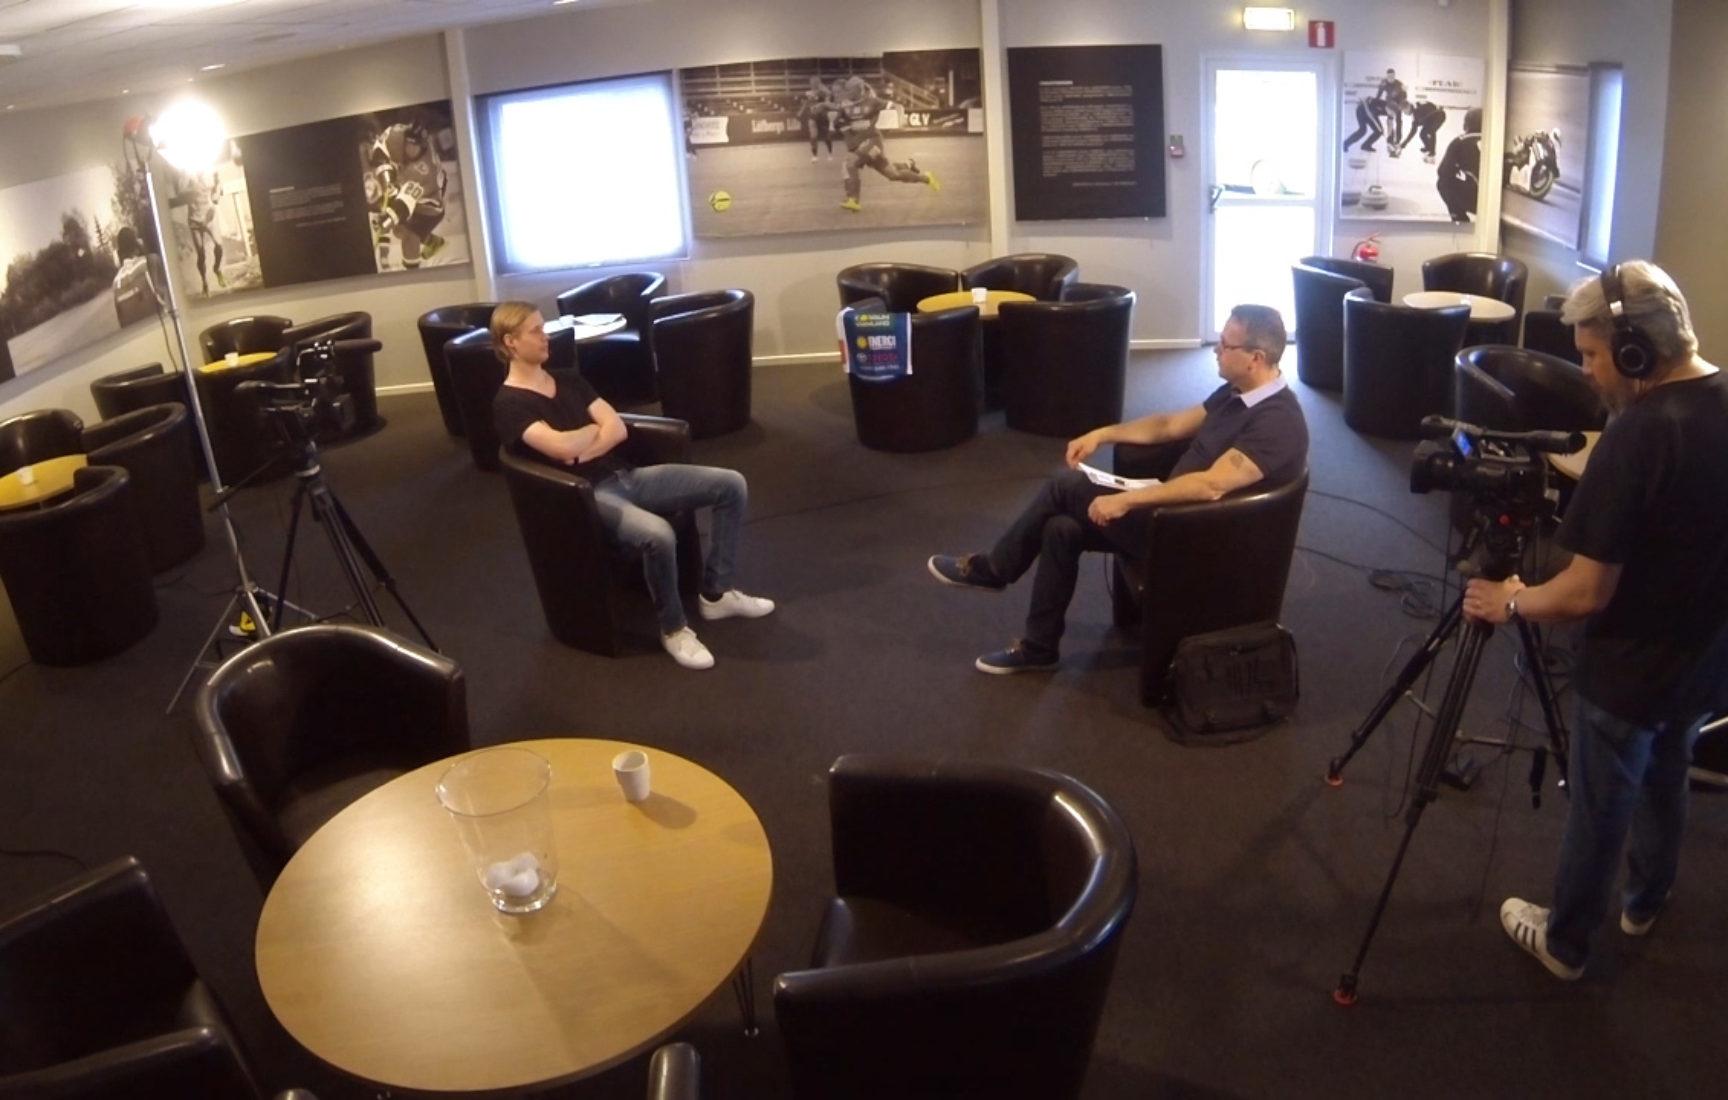 Glimt Sport – Adam Colling, Karlstad innebandy